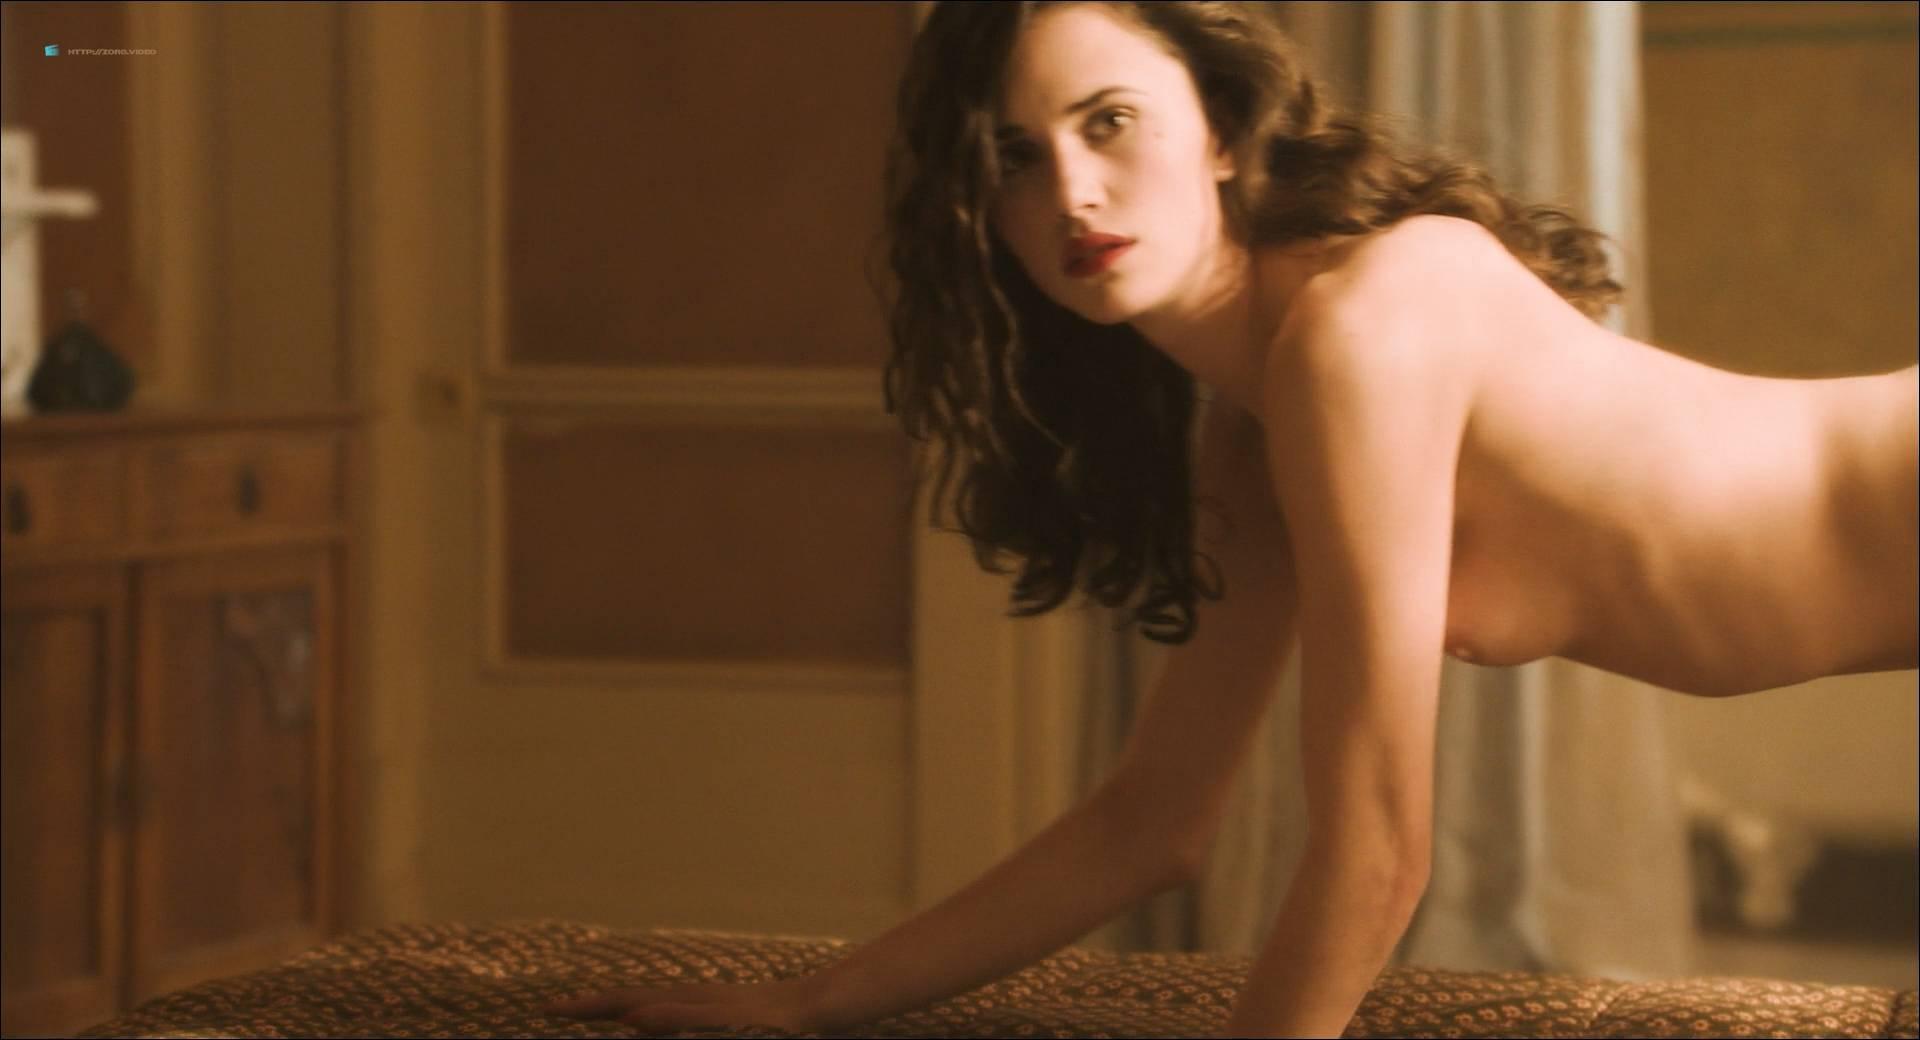 Эровидео марион котийяр, великие секс актрисы